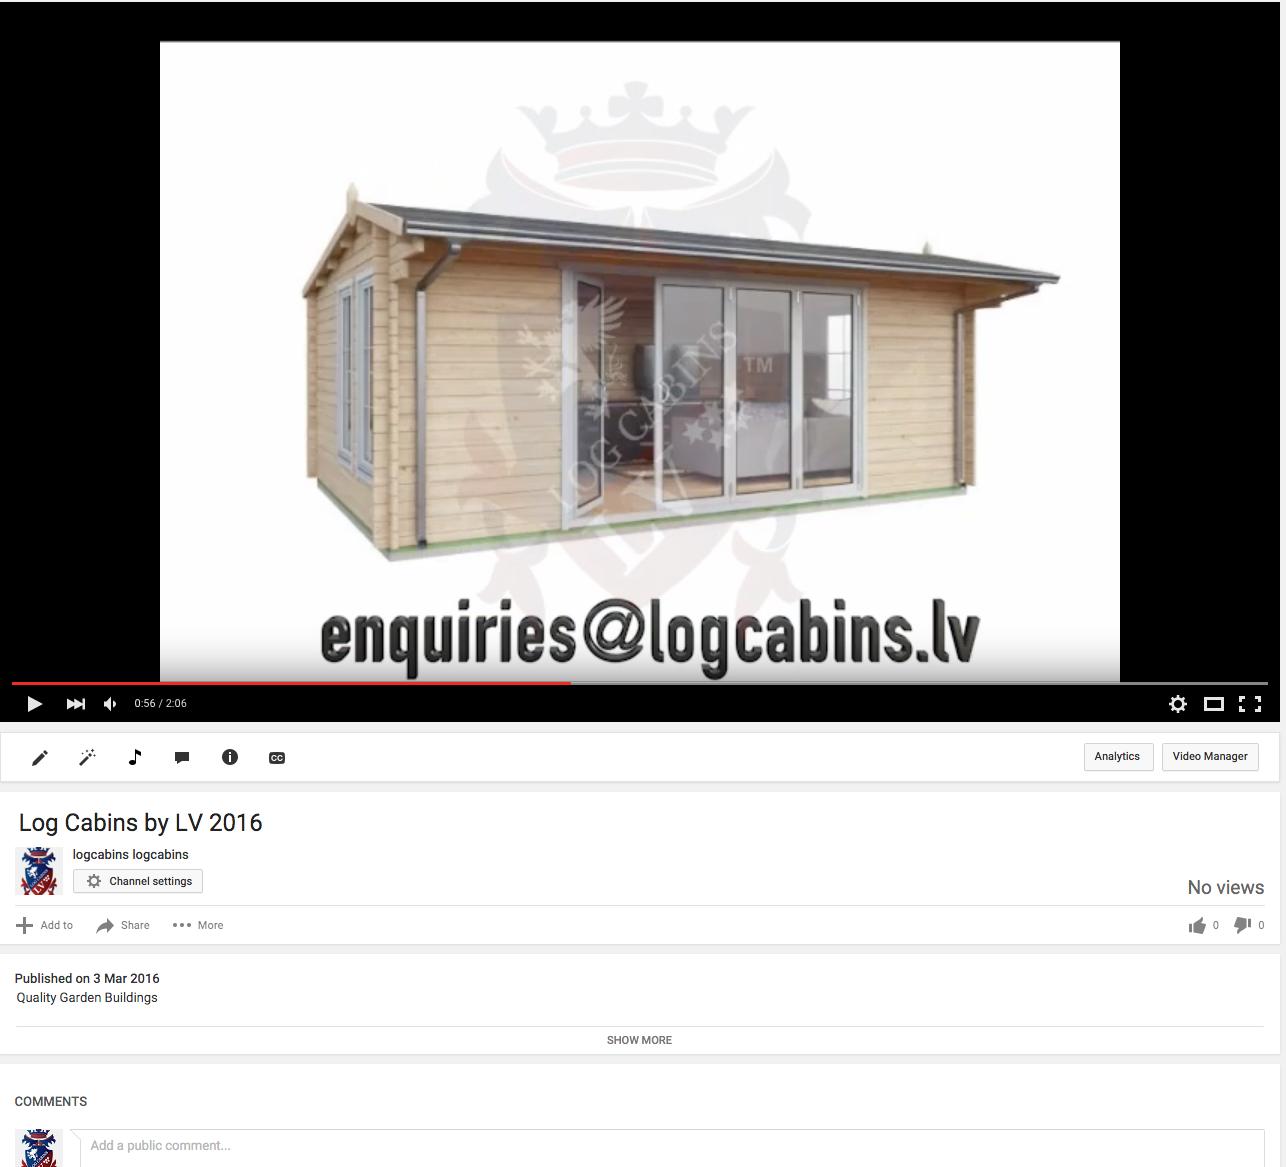 log cabins lv